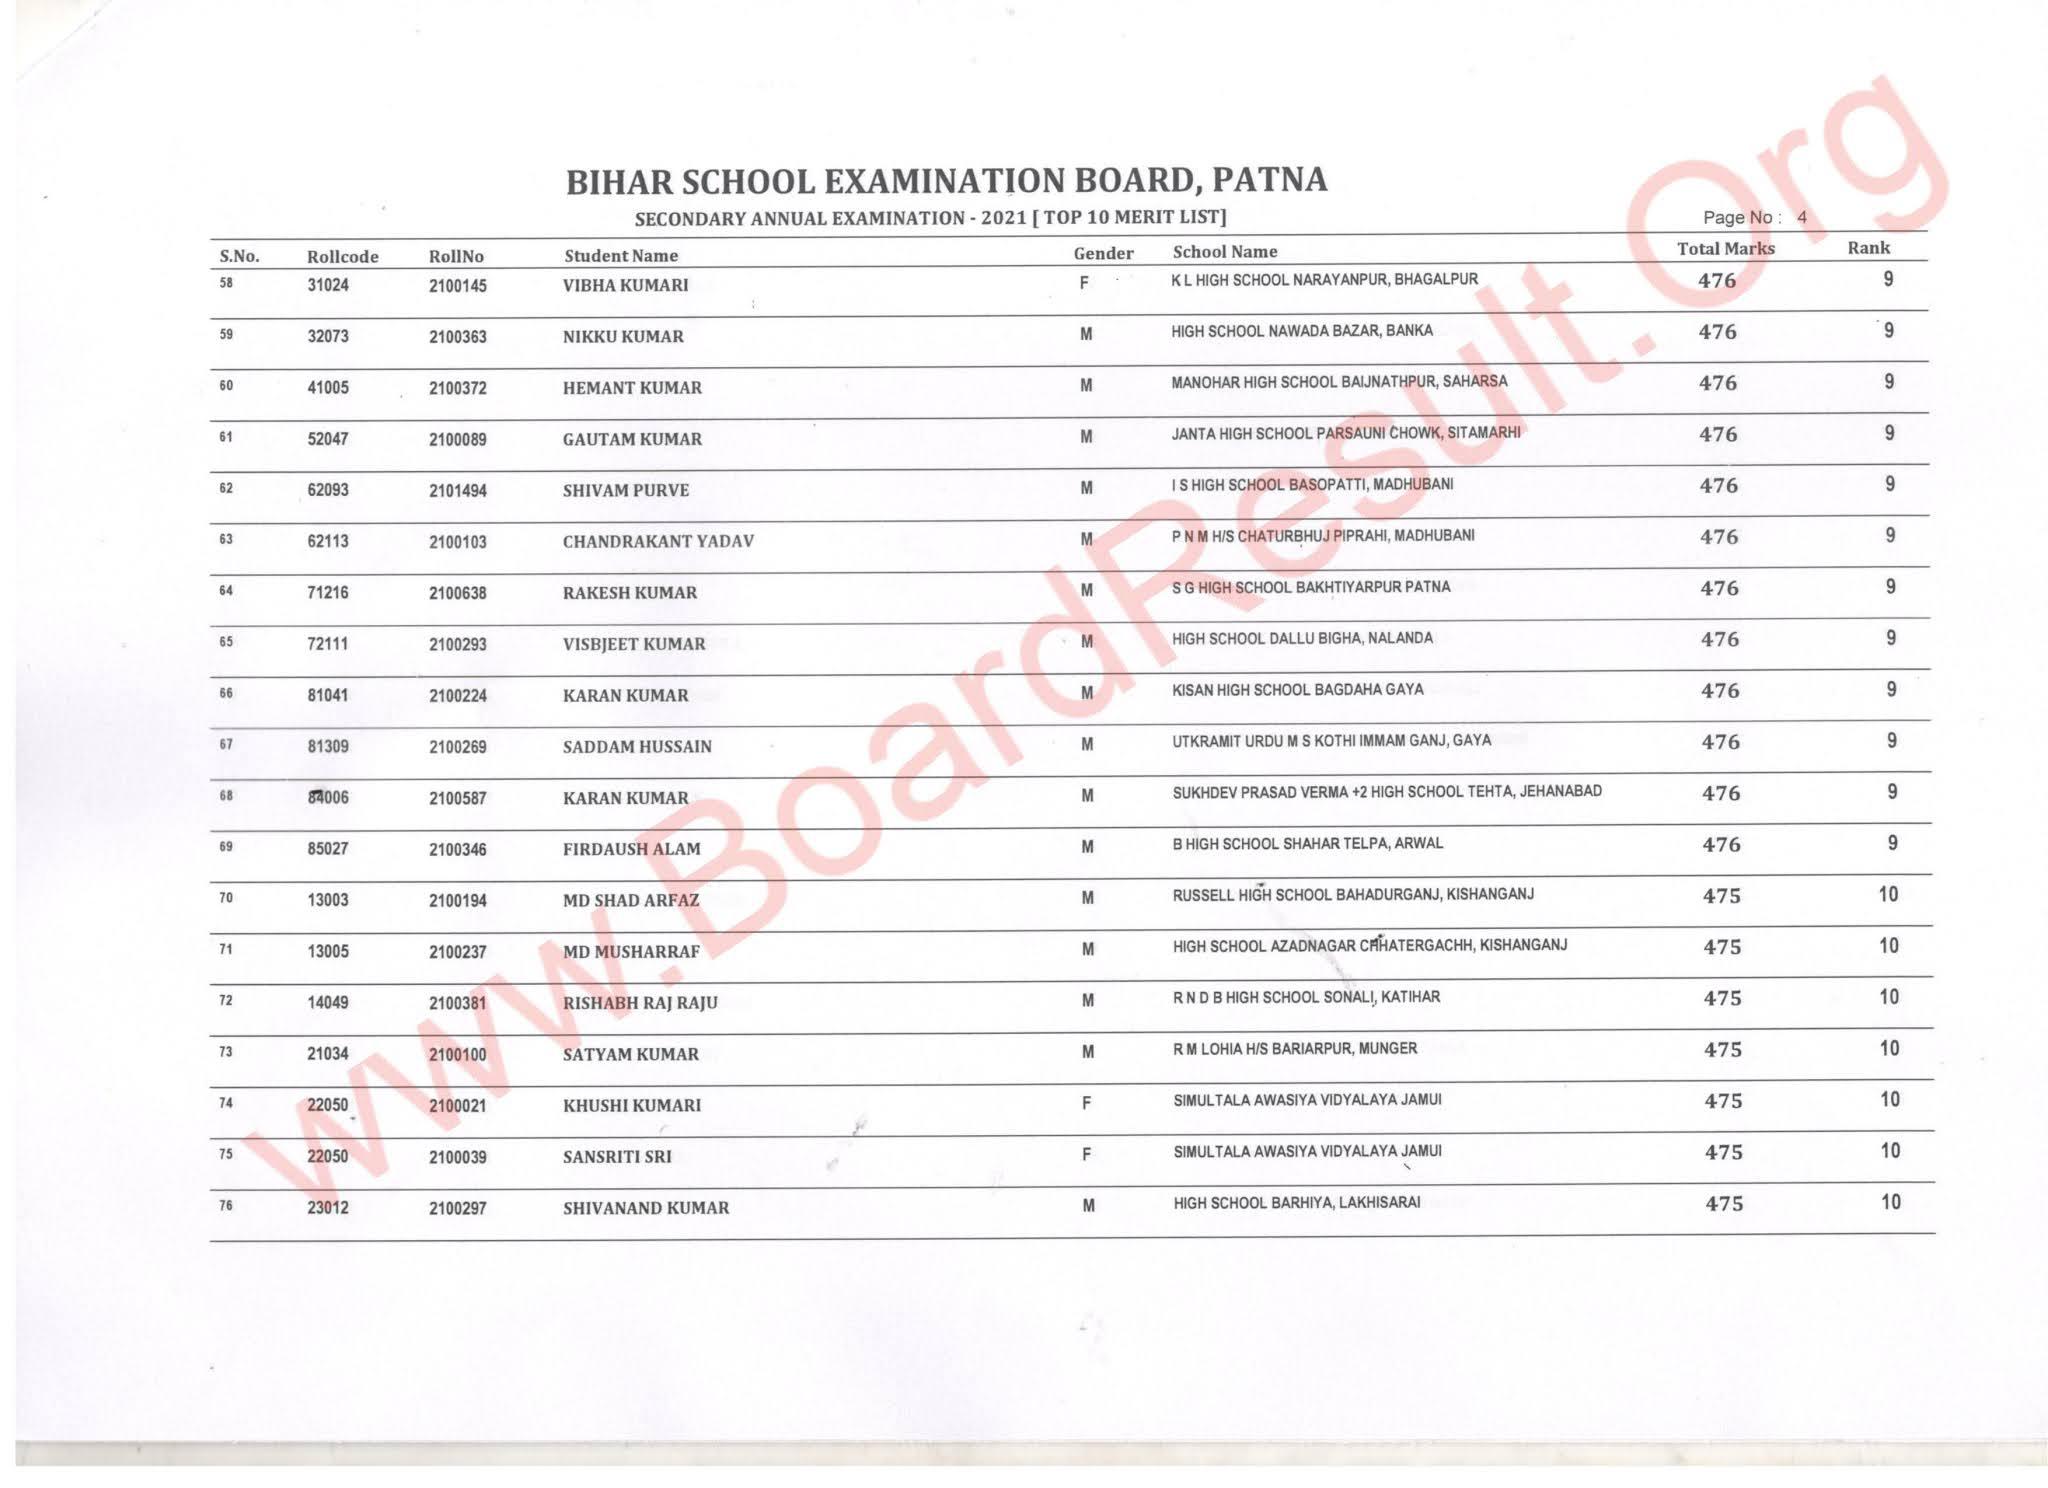 Bihar board 10th topper 2021 list